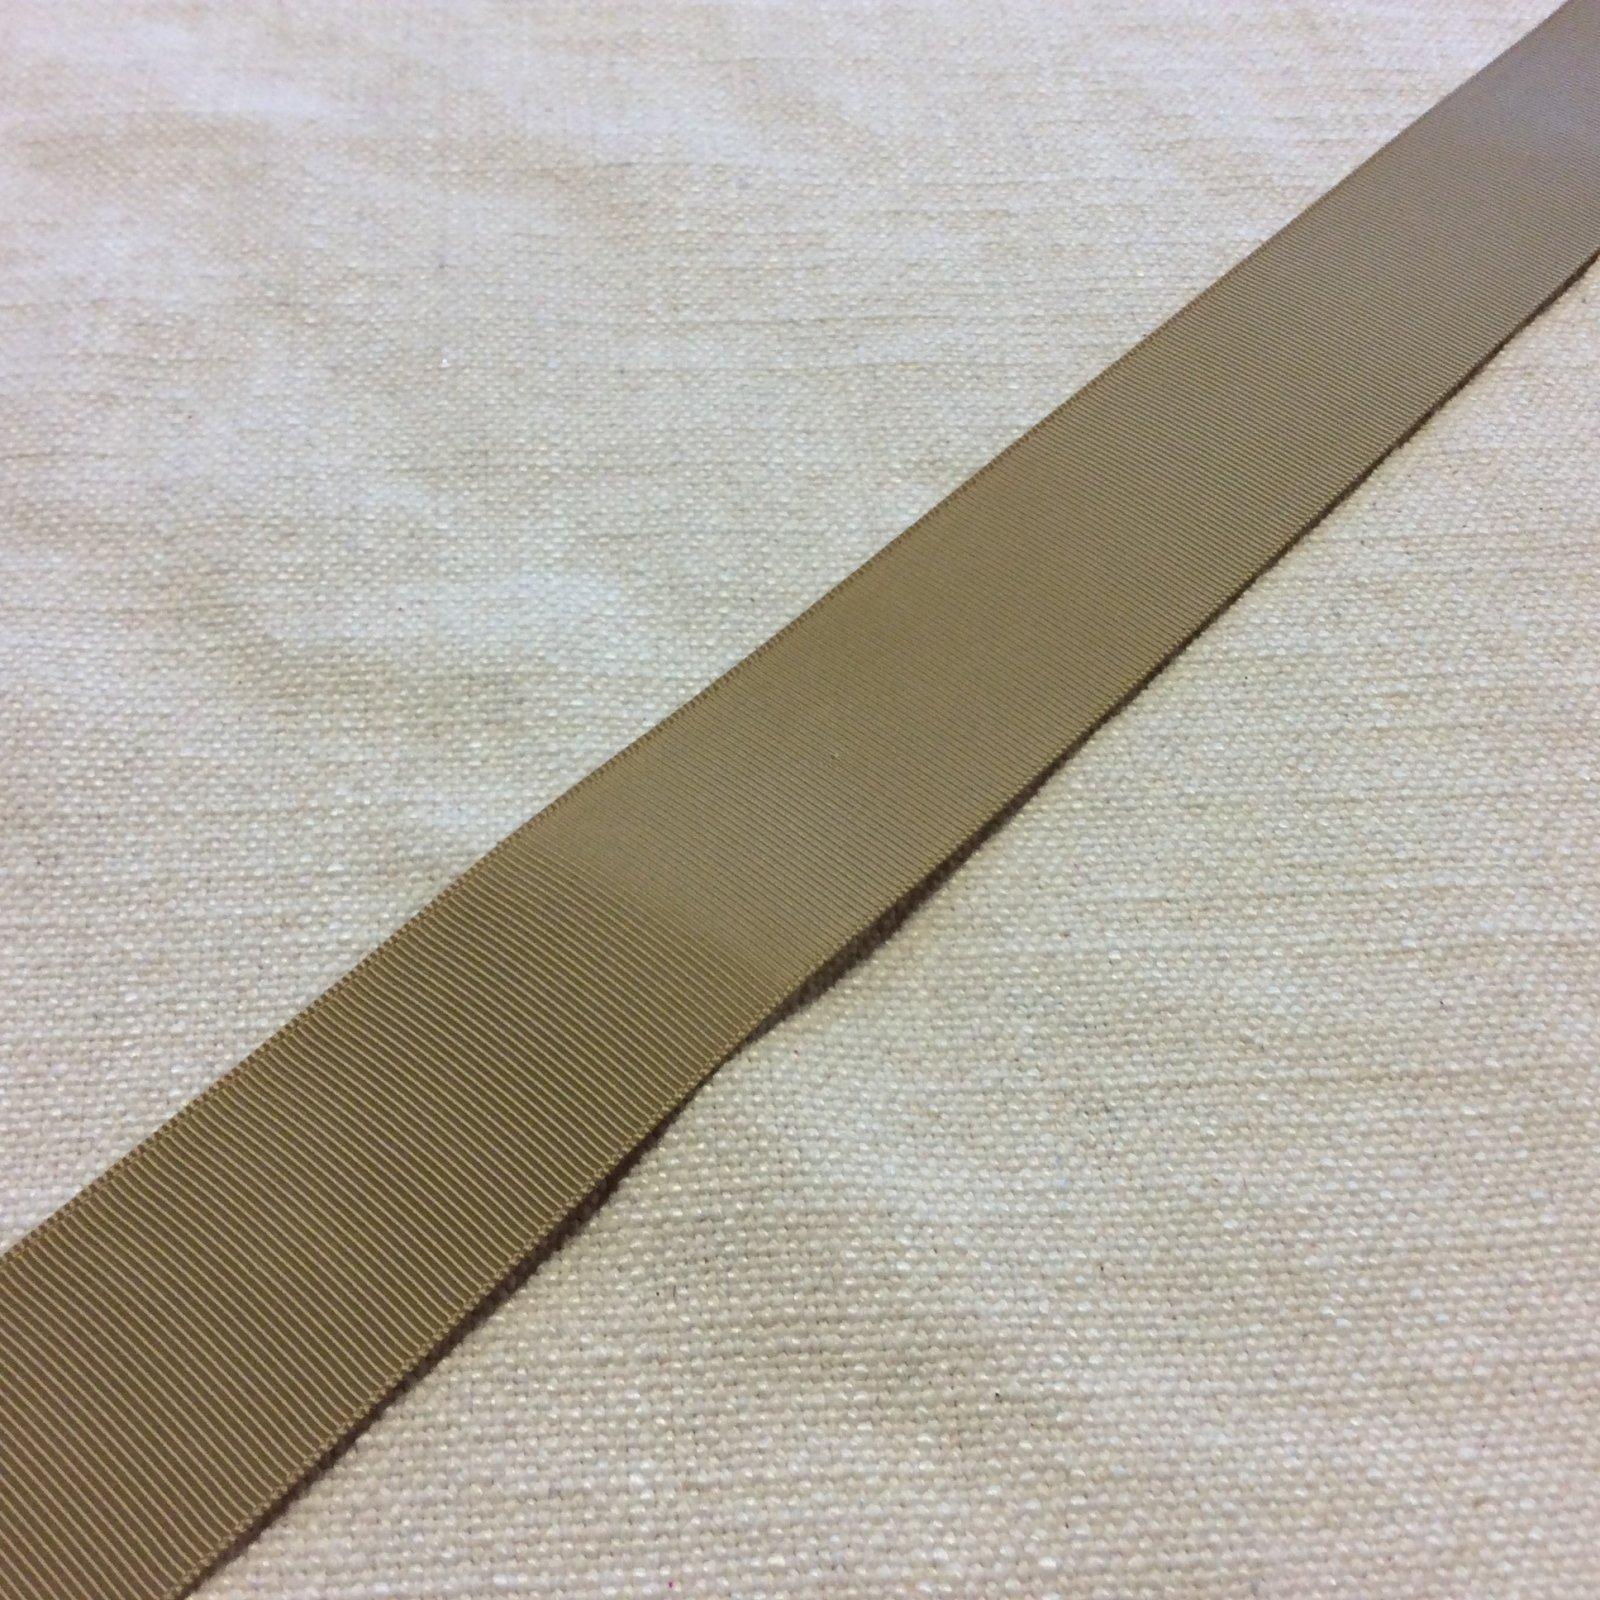 Grosgrain Ribbon 1.5 Soft Golden Wheat Trim Ribbon RIB1177